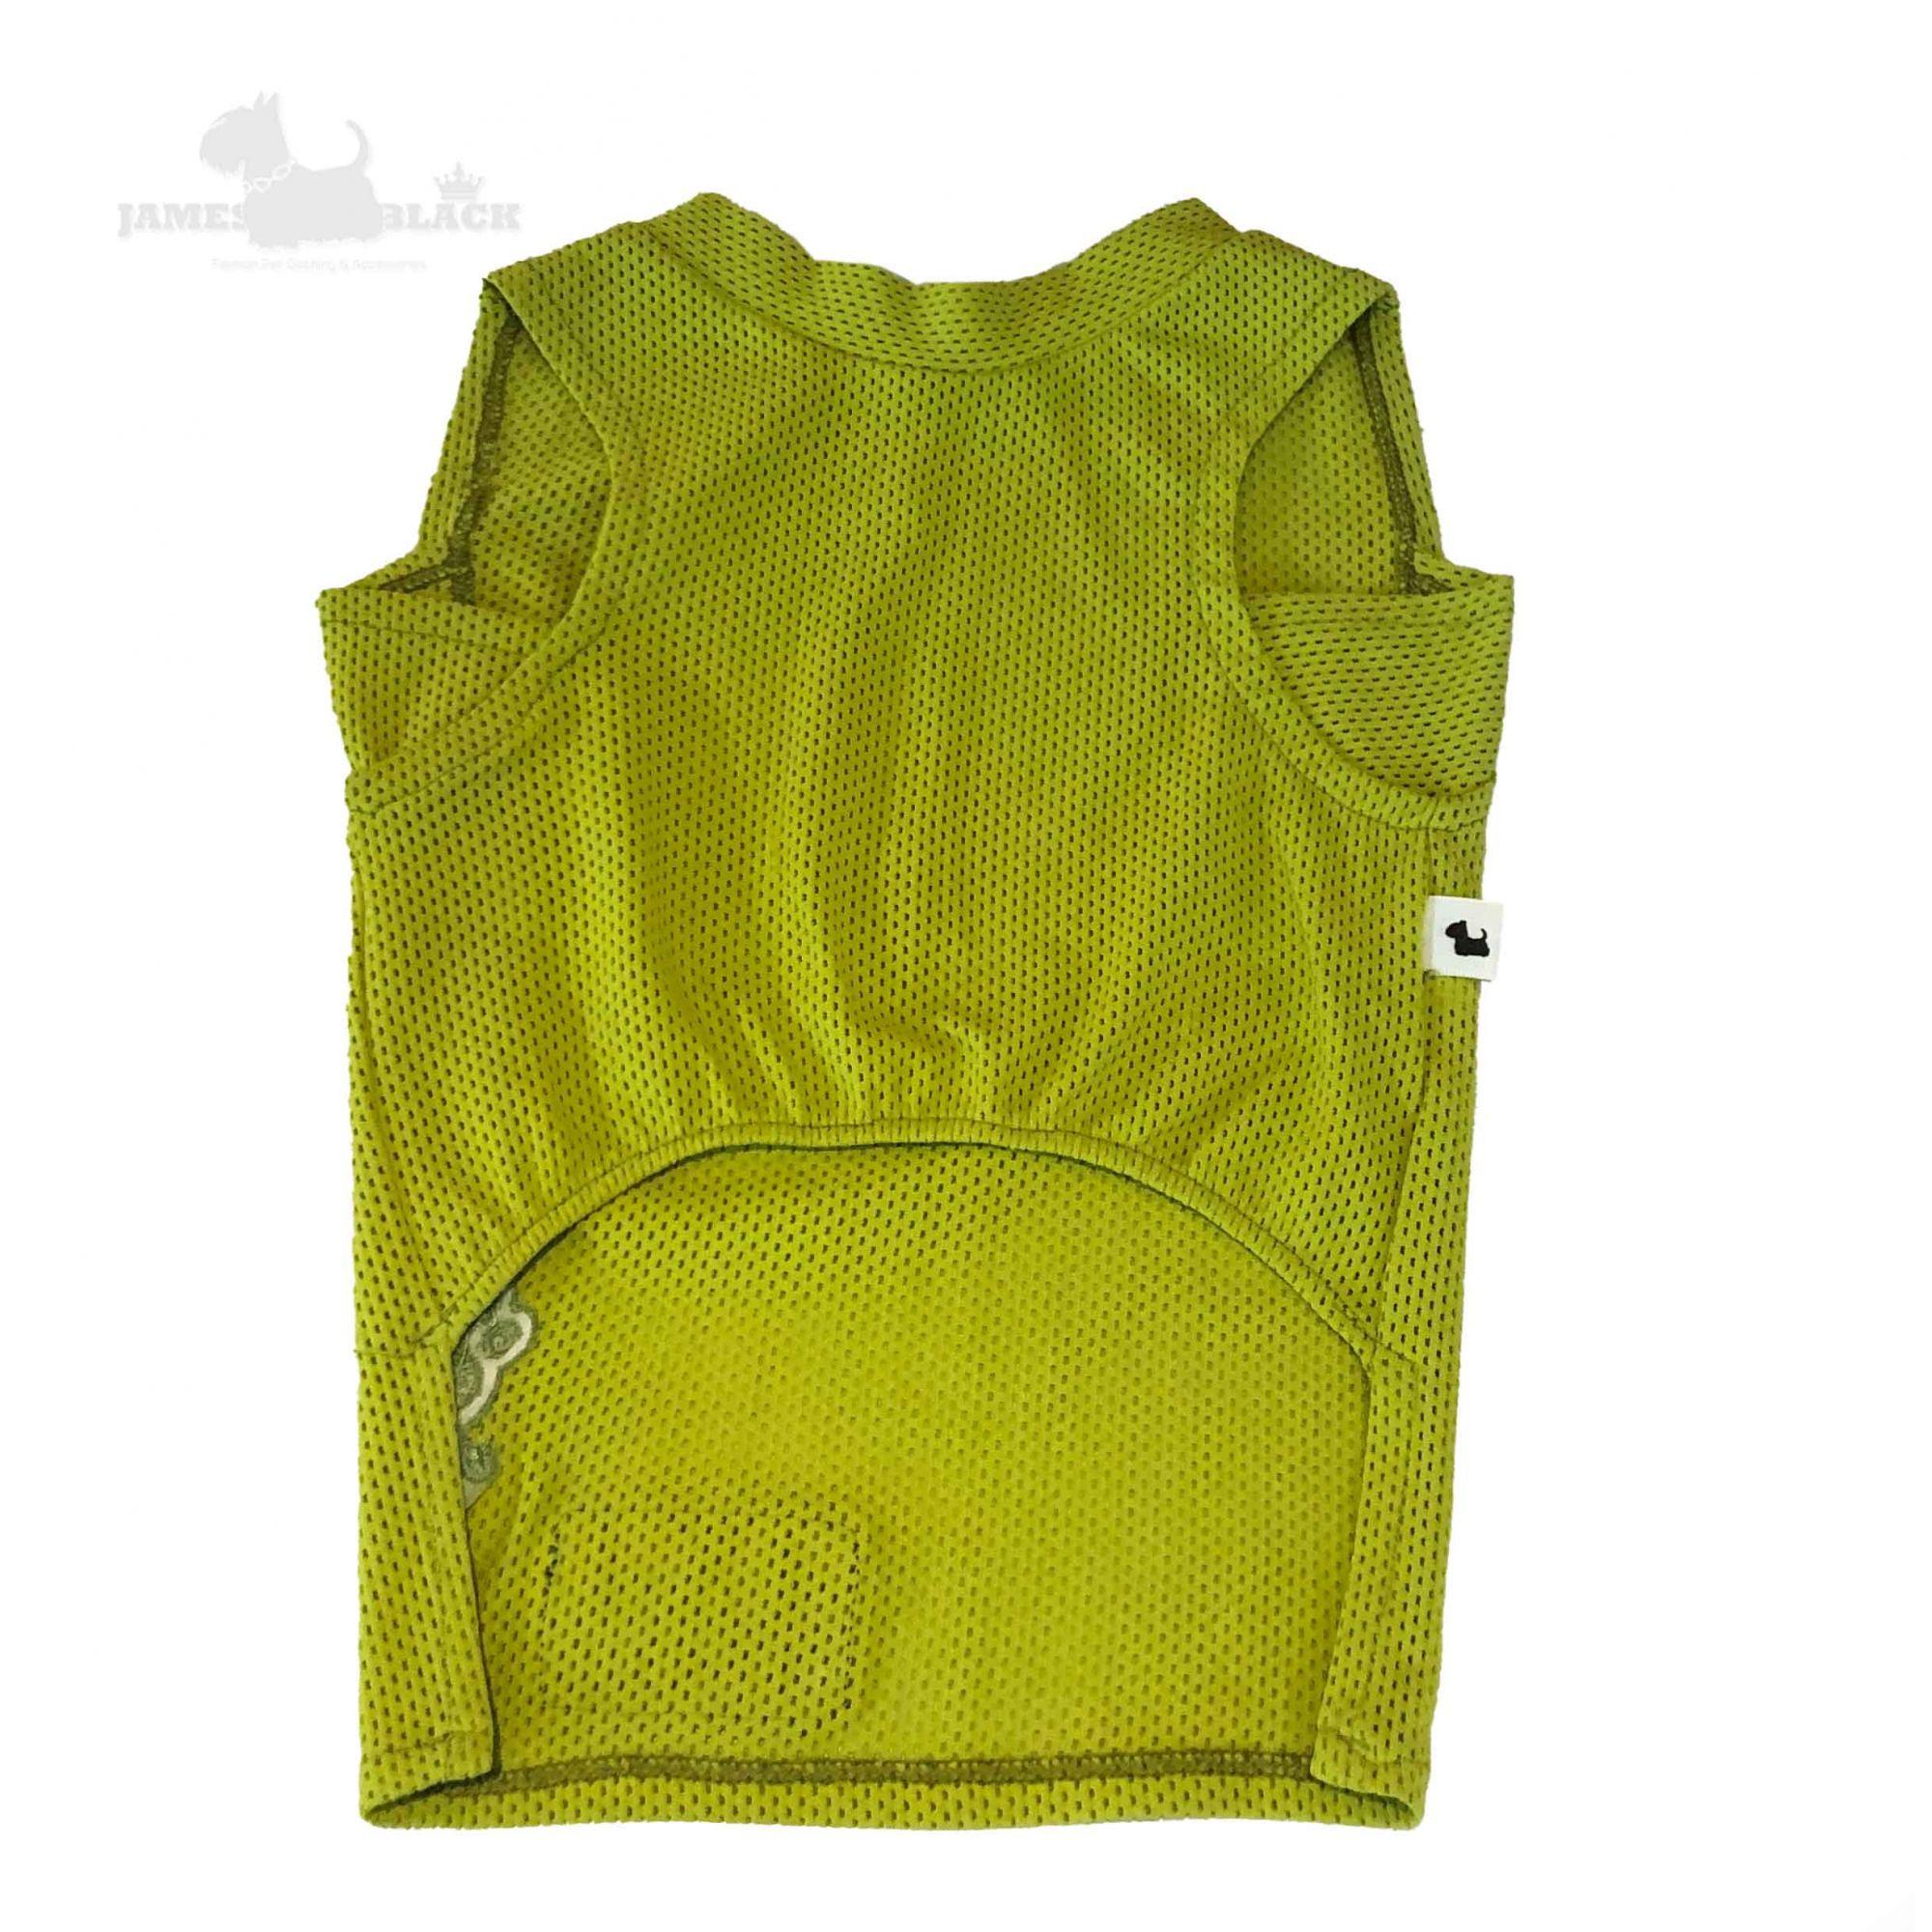 Camiseta Dryfit Mostarda Furos Medios e Patch